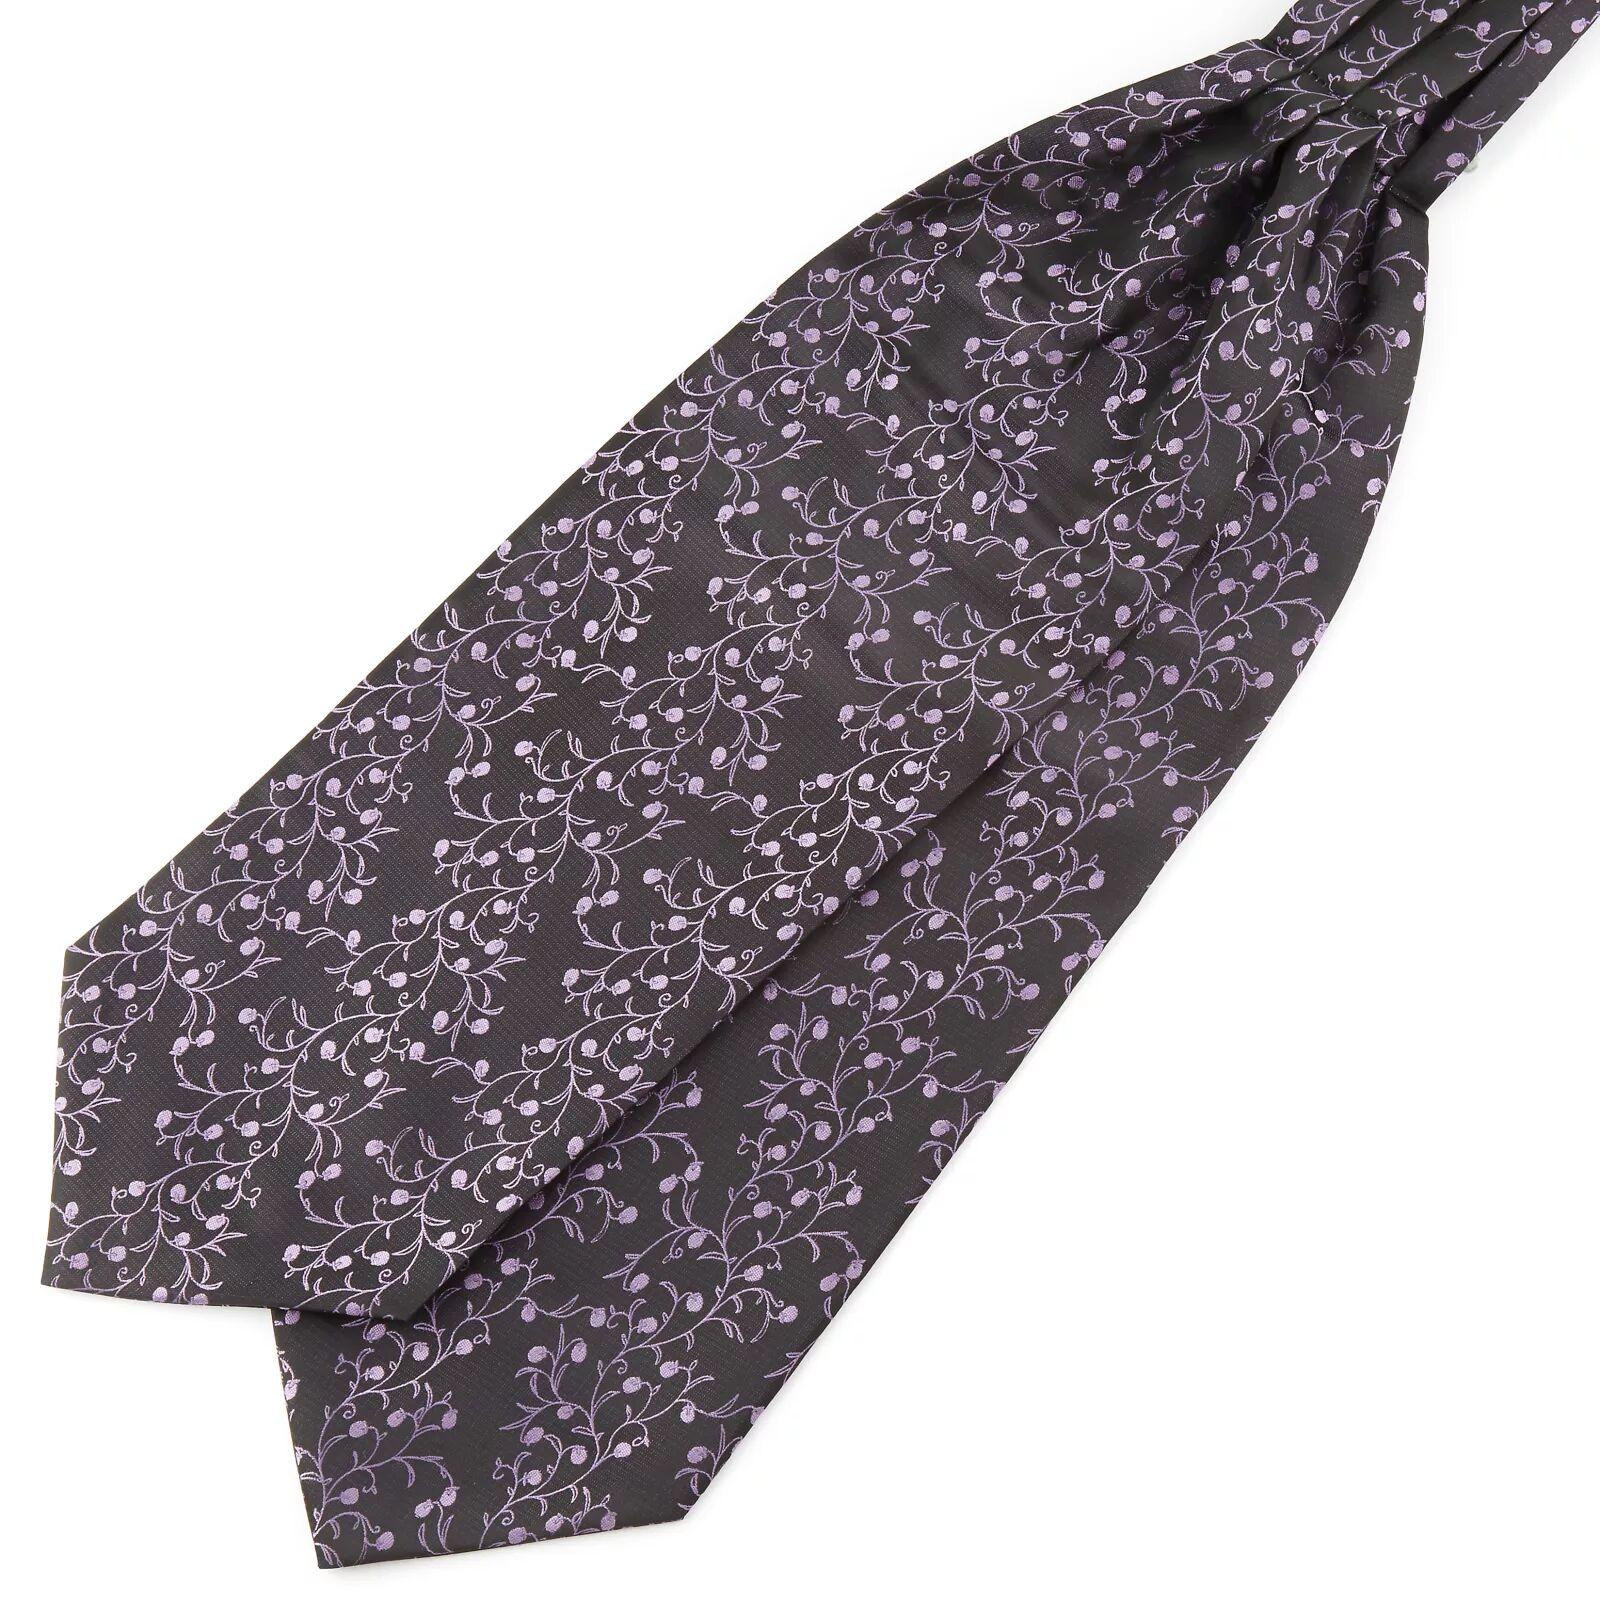 Tailor Toki Porvarillinen ruskea & laventeli polyesteri ascot-solmio